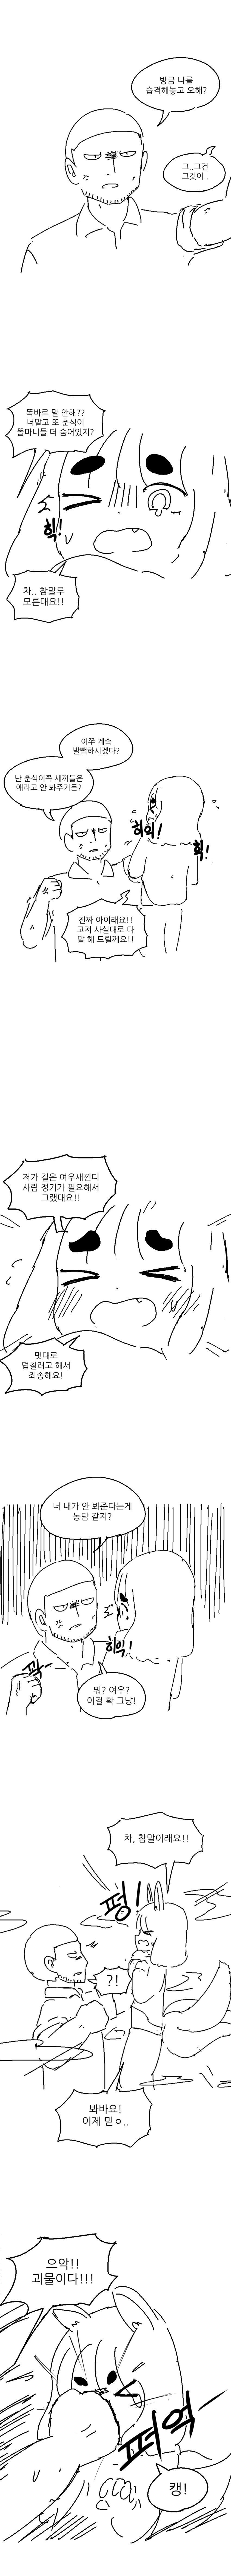 Internet_20191220_072612_6.jpeg 조폭이랑 꼬마 여자애가 하룻밤 보내는.manhwa